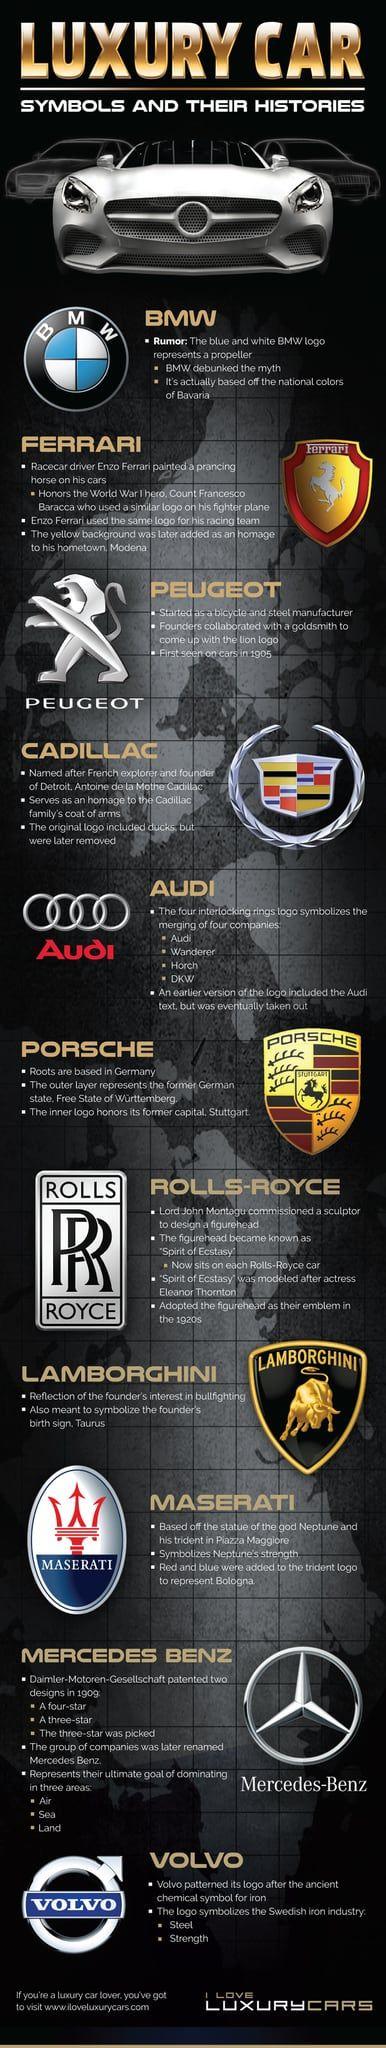 Luxury Cars Symbols and Their Logo History   I Love Luxury Cars   https://iloveluxurycars.com/luxury-cars-symbols/?utm_source=pin